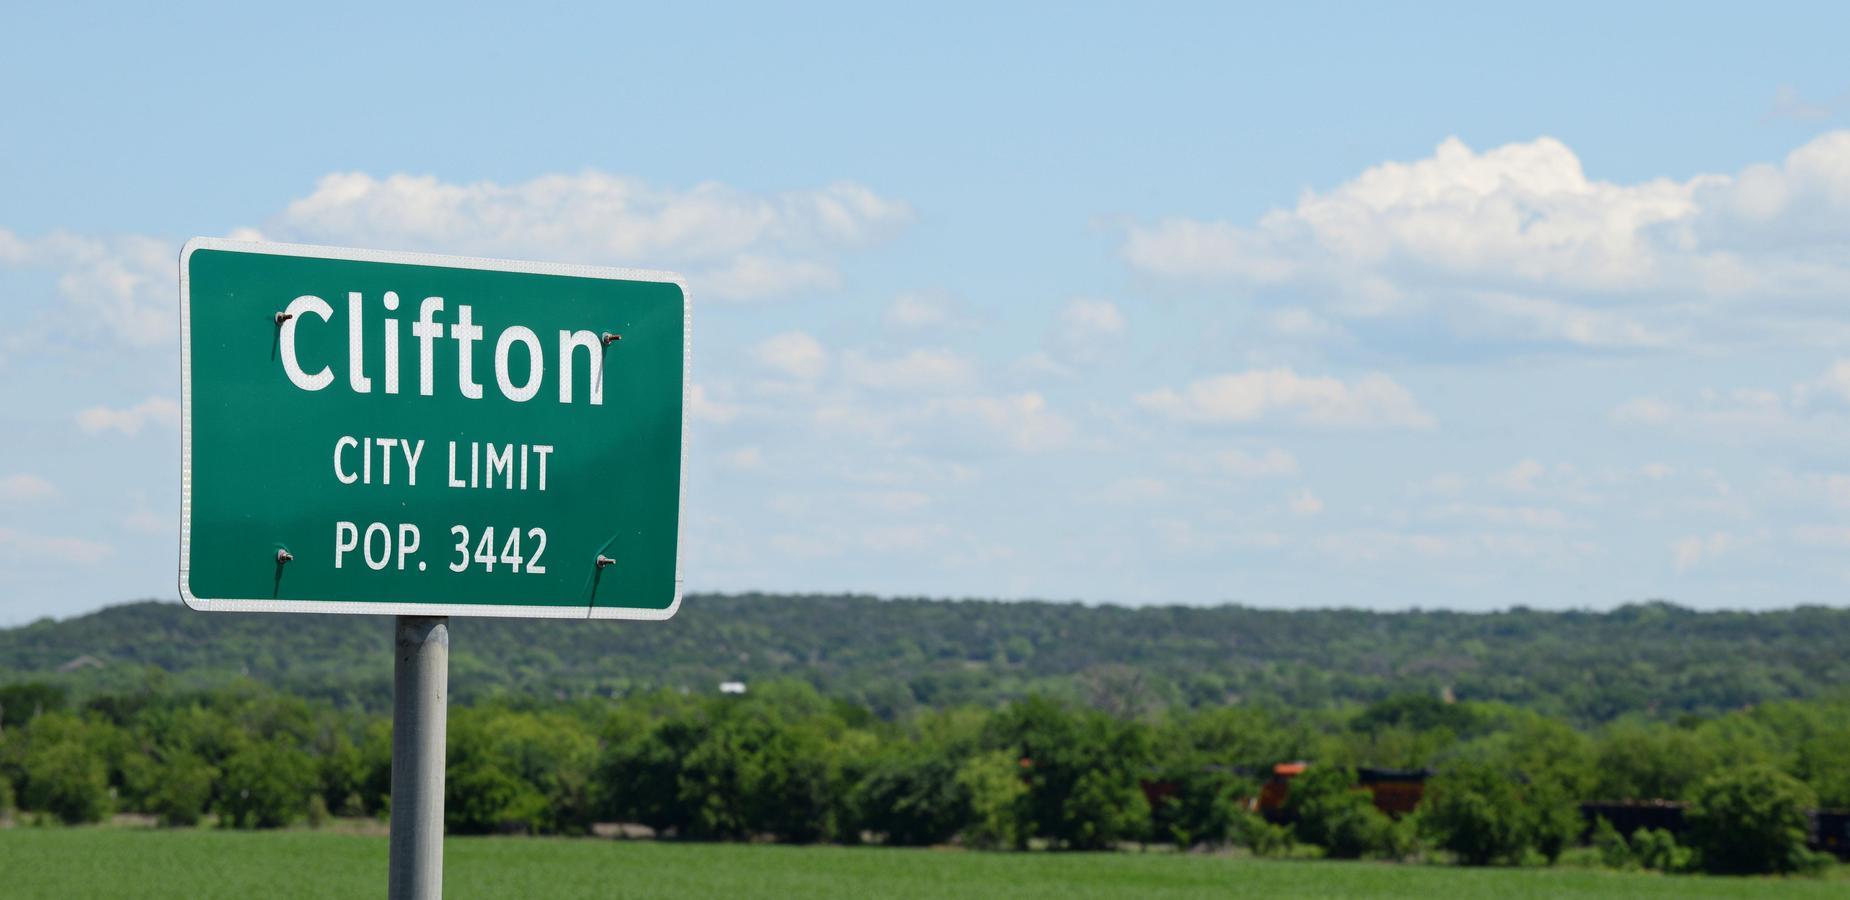 Clifton City Limits Sign Pop. 3442